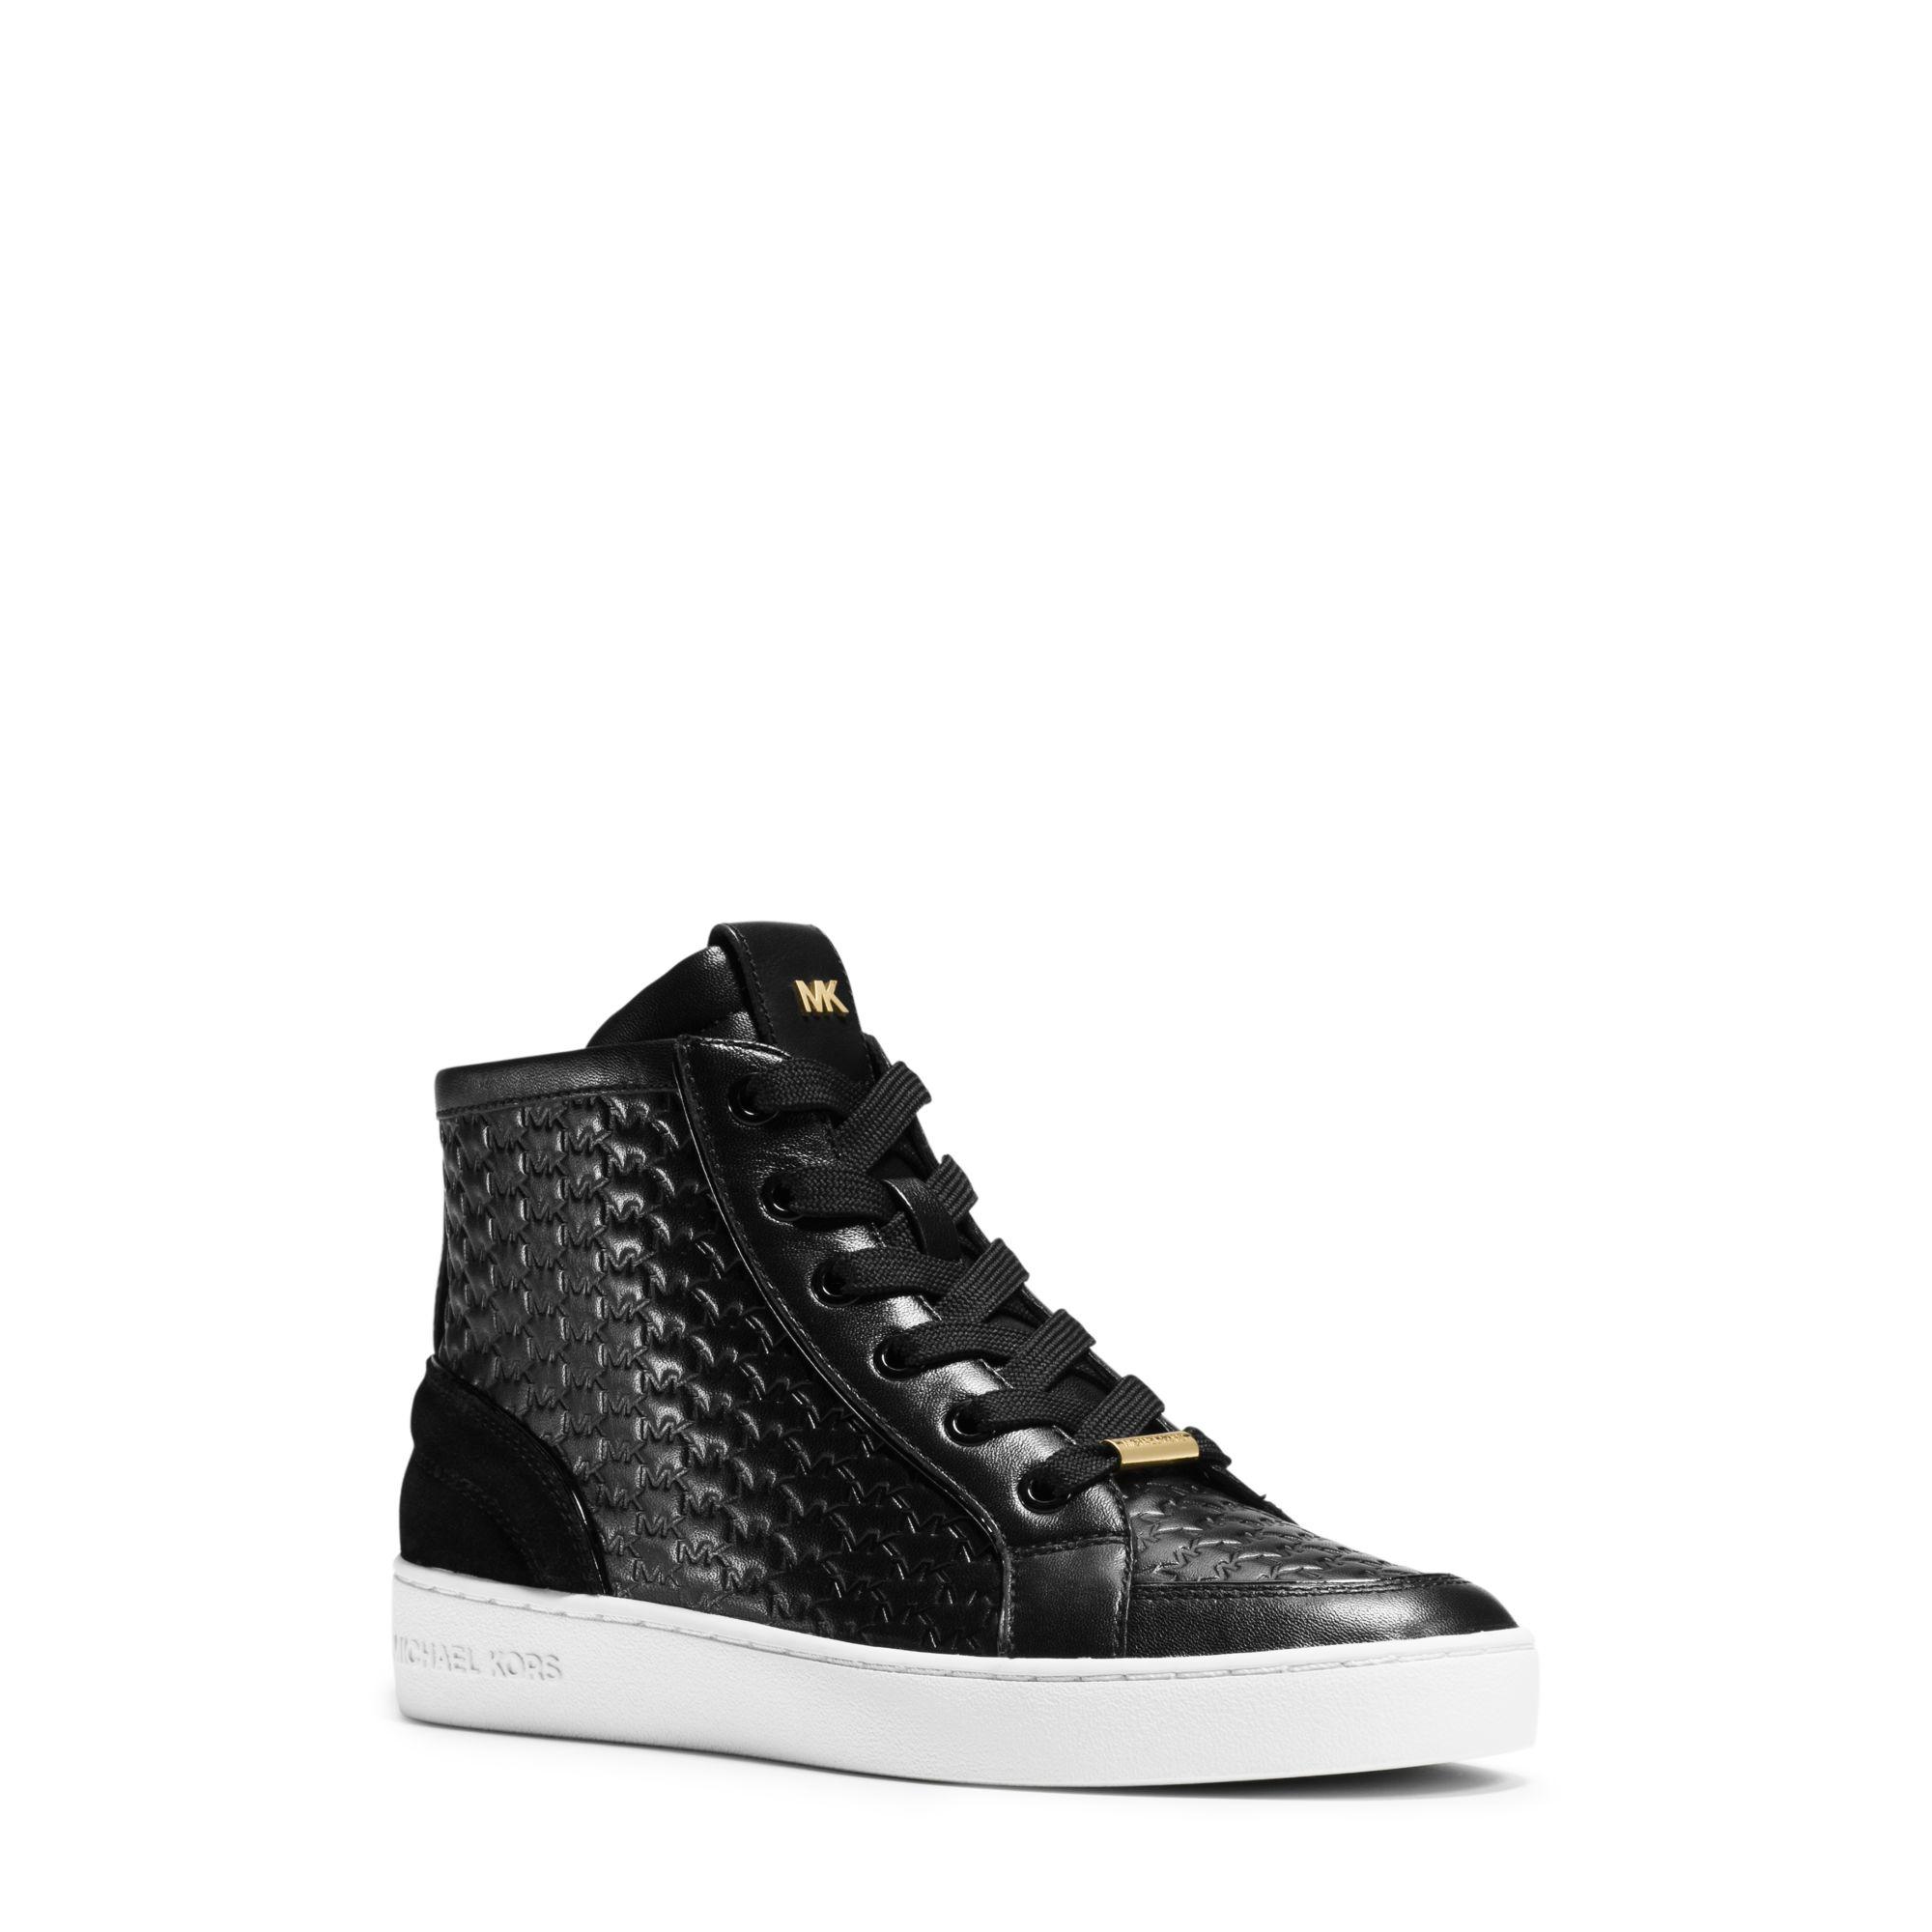 michael kors colby embossed high top sneakers in black lyst. Black Bedroom Furniture Sets. Home Design Ideas